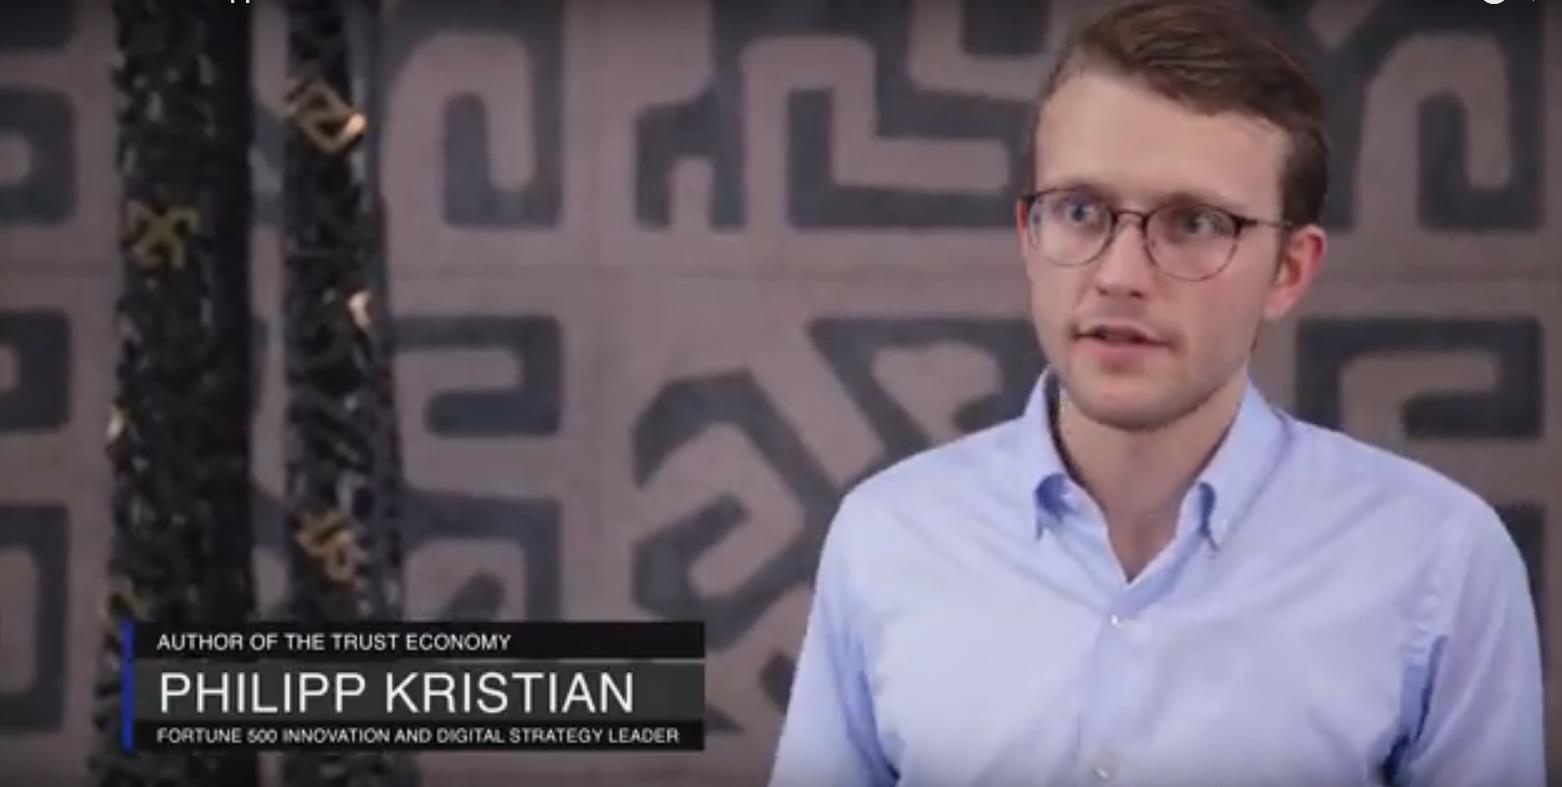 Interview with Philipp Kristian: Blockchain & Smart Contracts Future